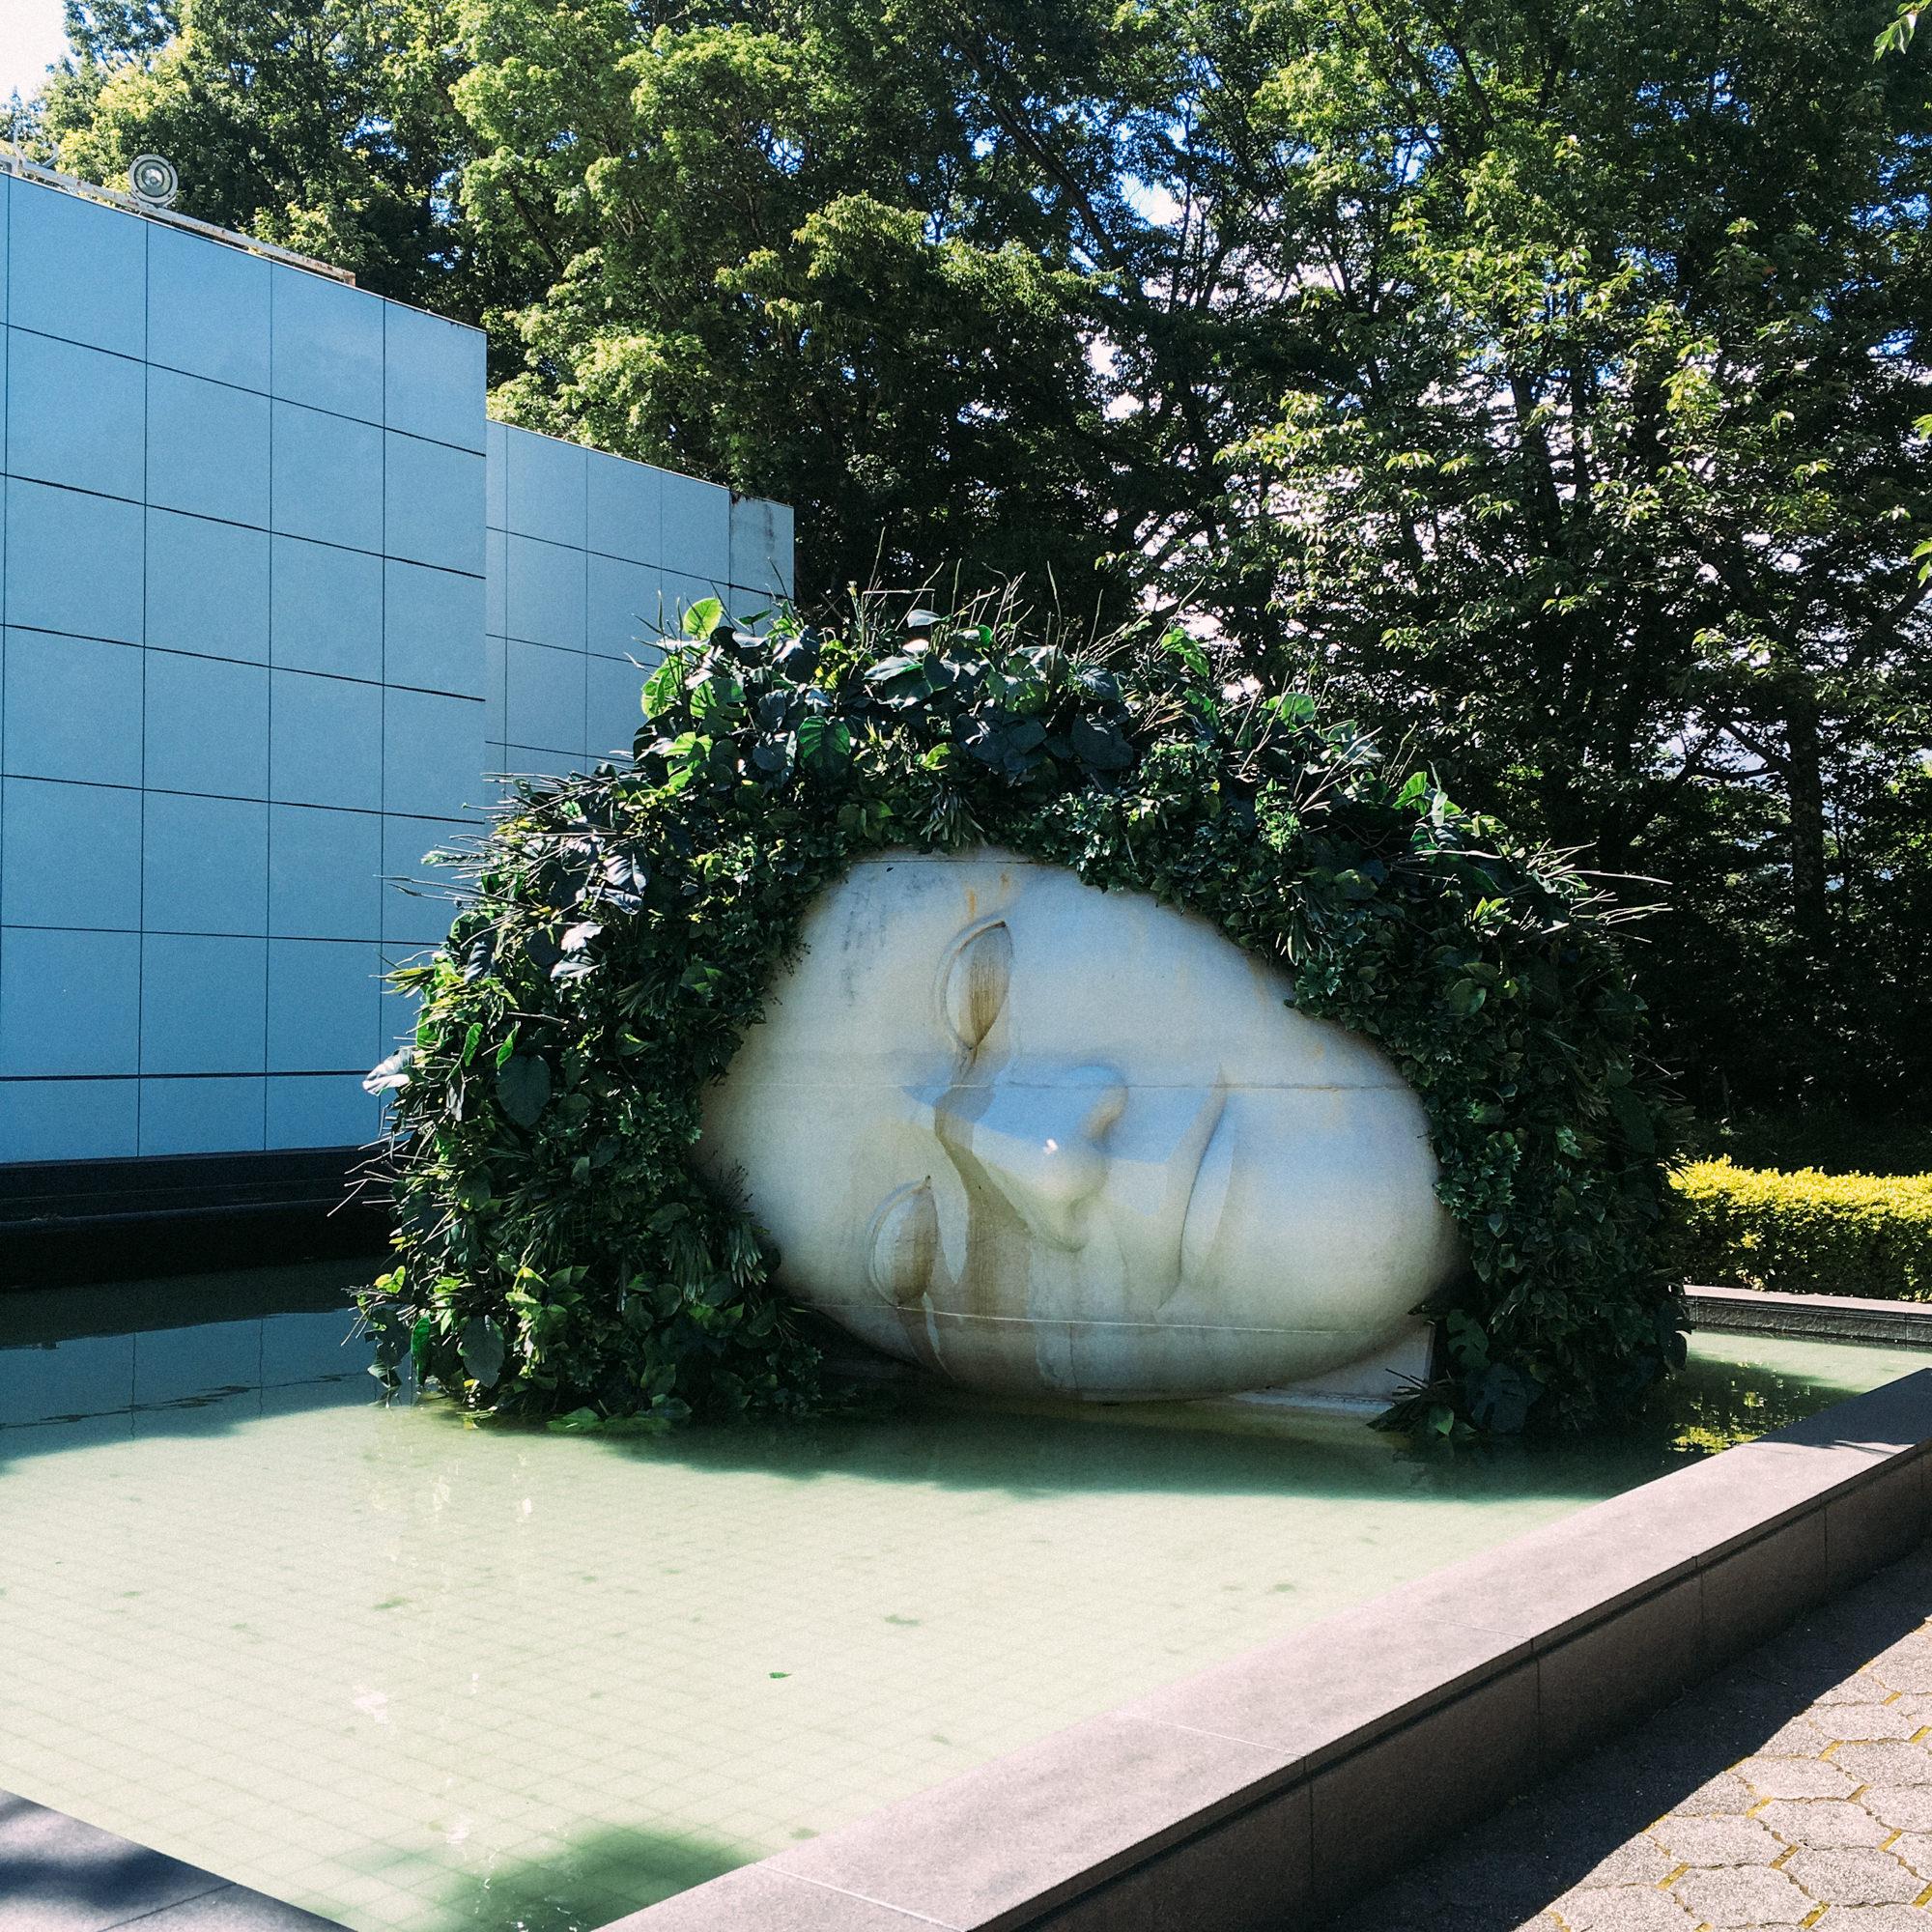 wrenee-hakone-open-air-museum--japan-39.jpg